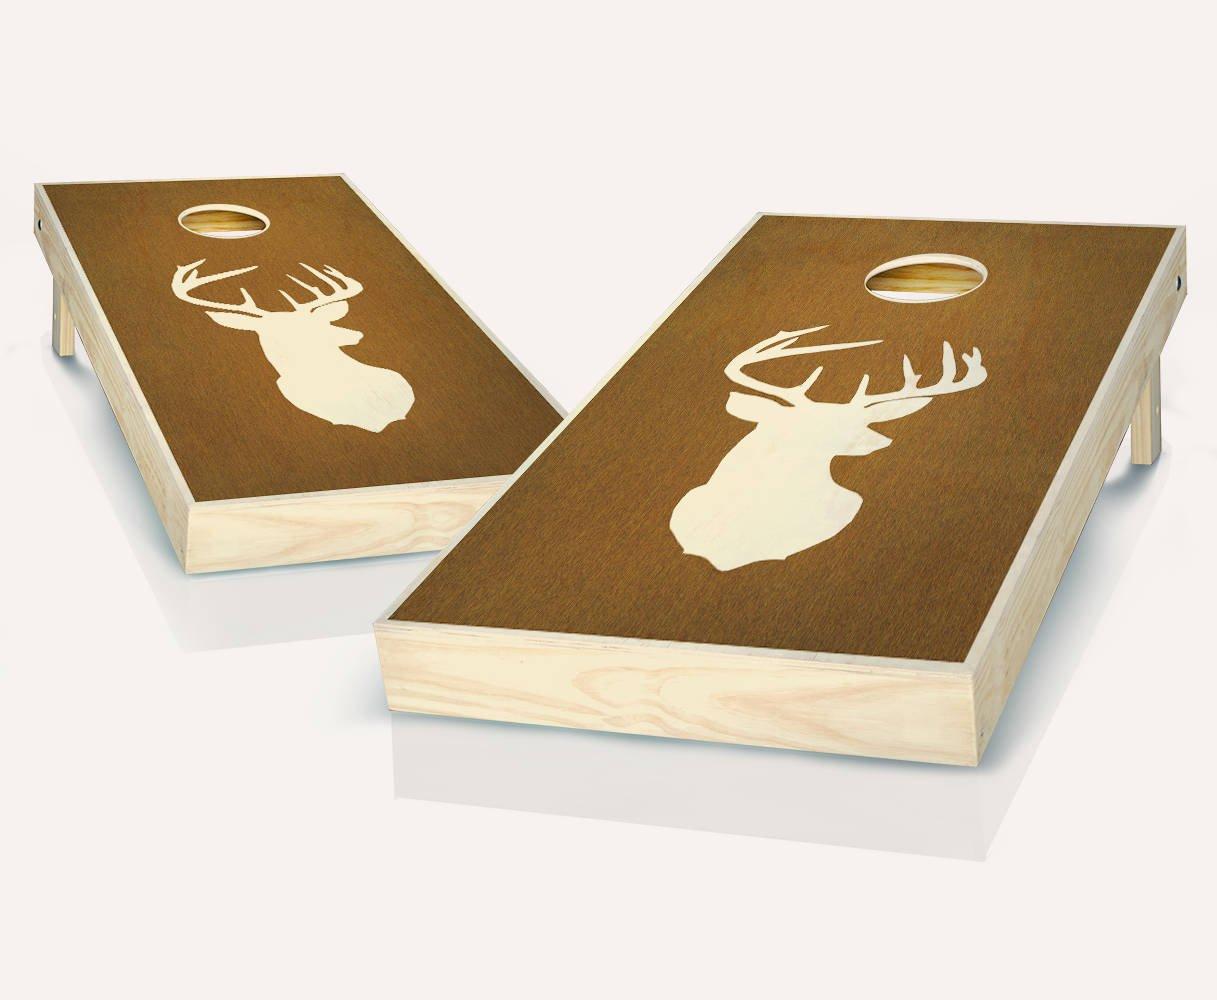 Buck Deer Head Chestnut StainedカスタムCornholeボードregulation sizeゲームセットBaggo Bean Bag Toss + 8 ACA Regulation Bags B07CMDG41S